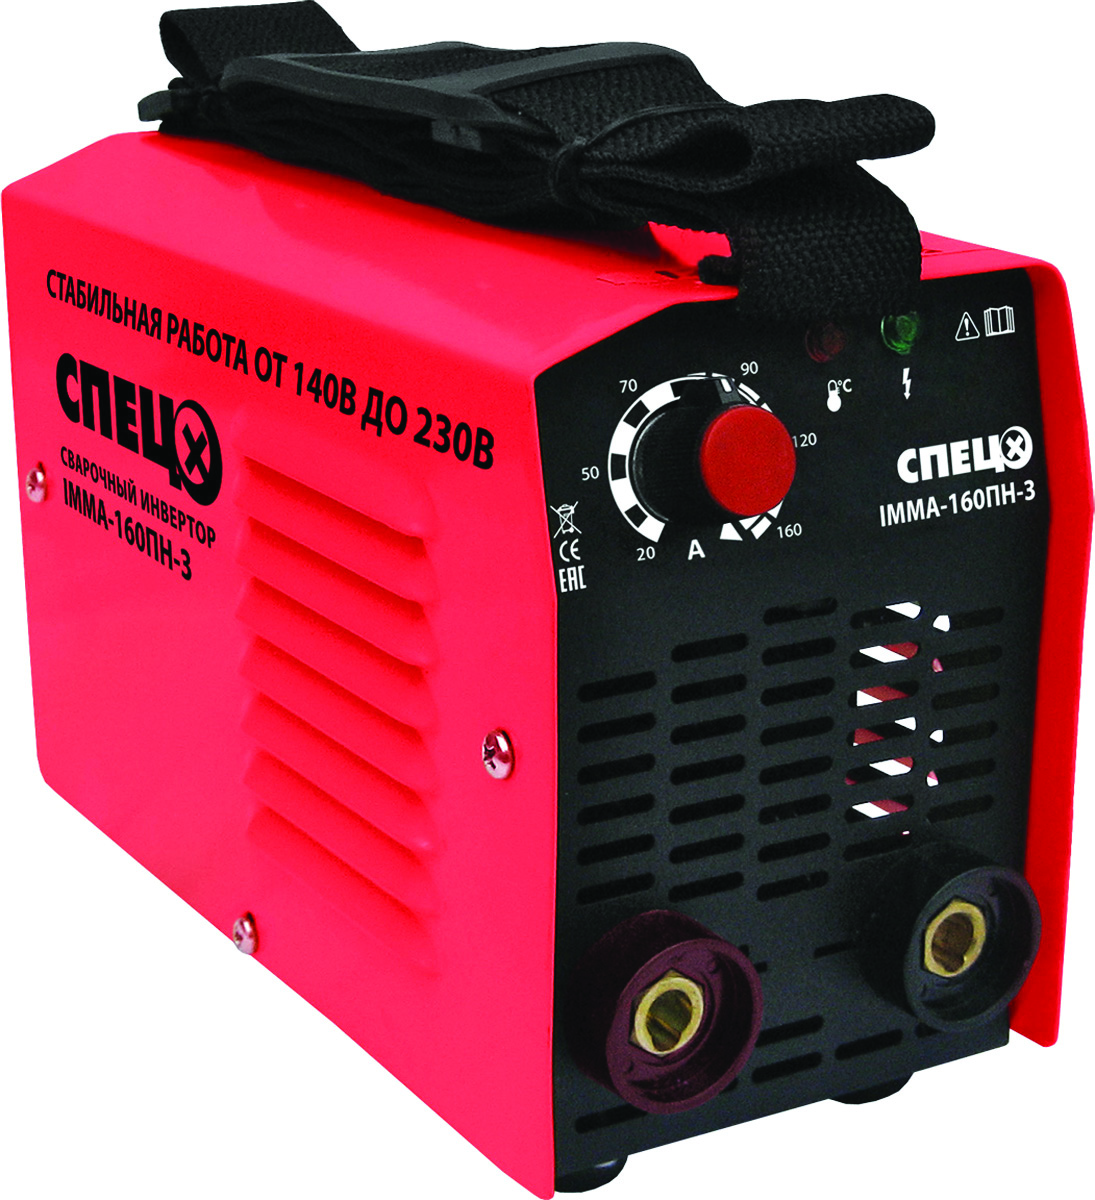 цена на Сварочный инвертор Спец IMMA-160ПН-3